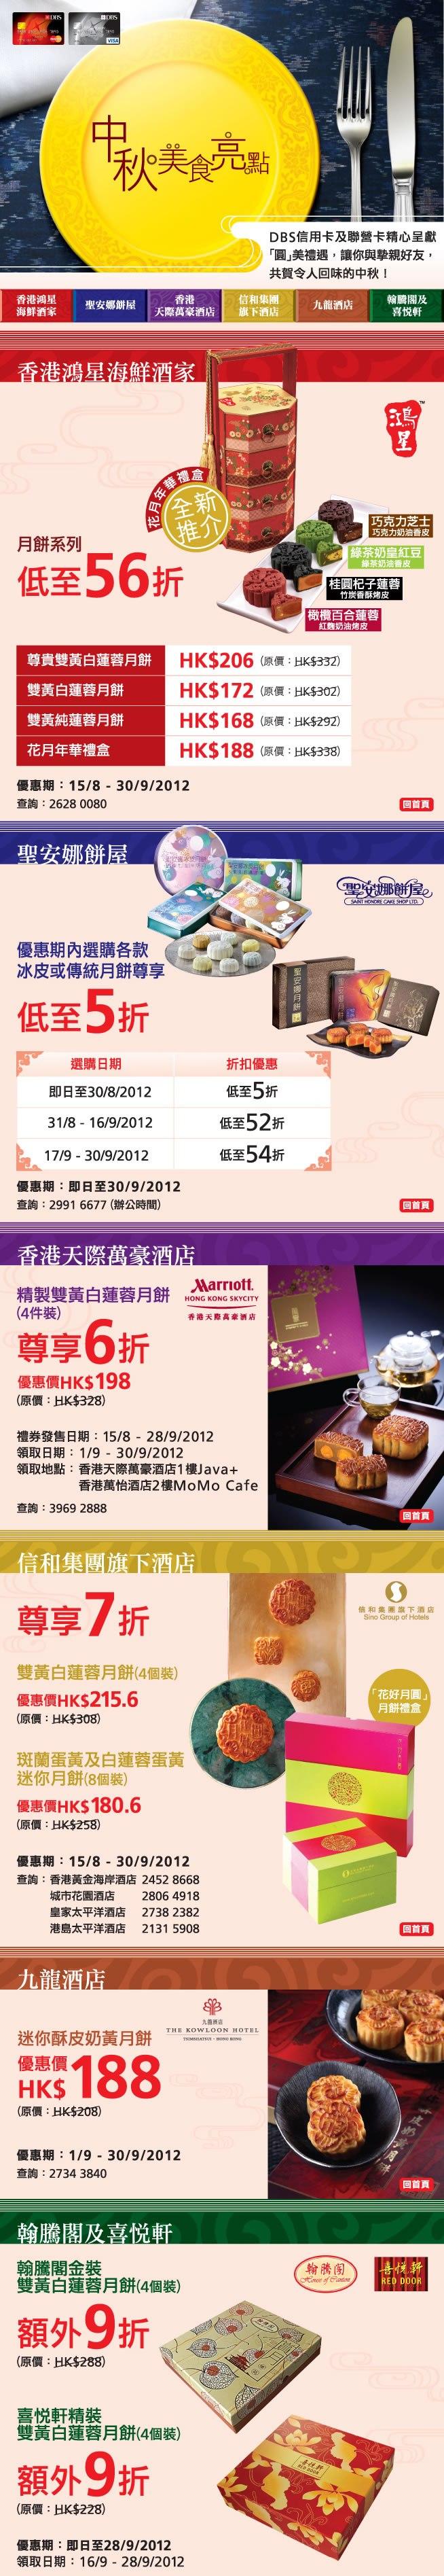 DBS信用卡及聯營卡 - 選購月餅尊享低至5折優惠 | HK Finance Jetso